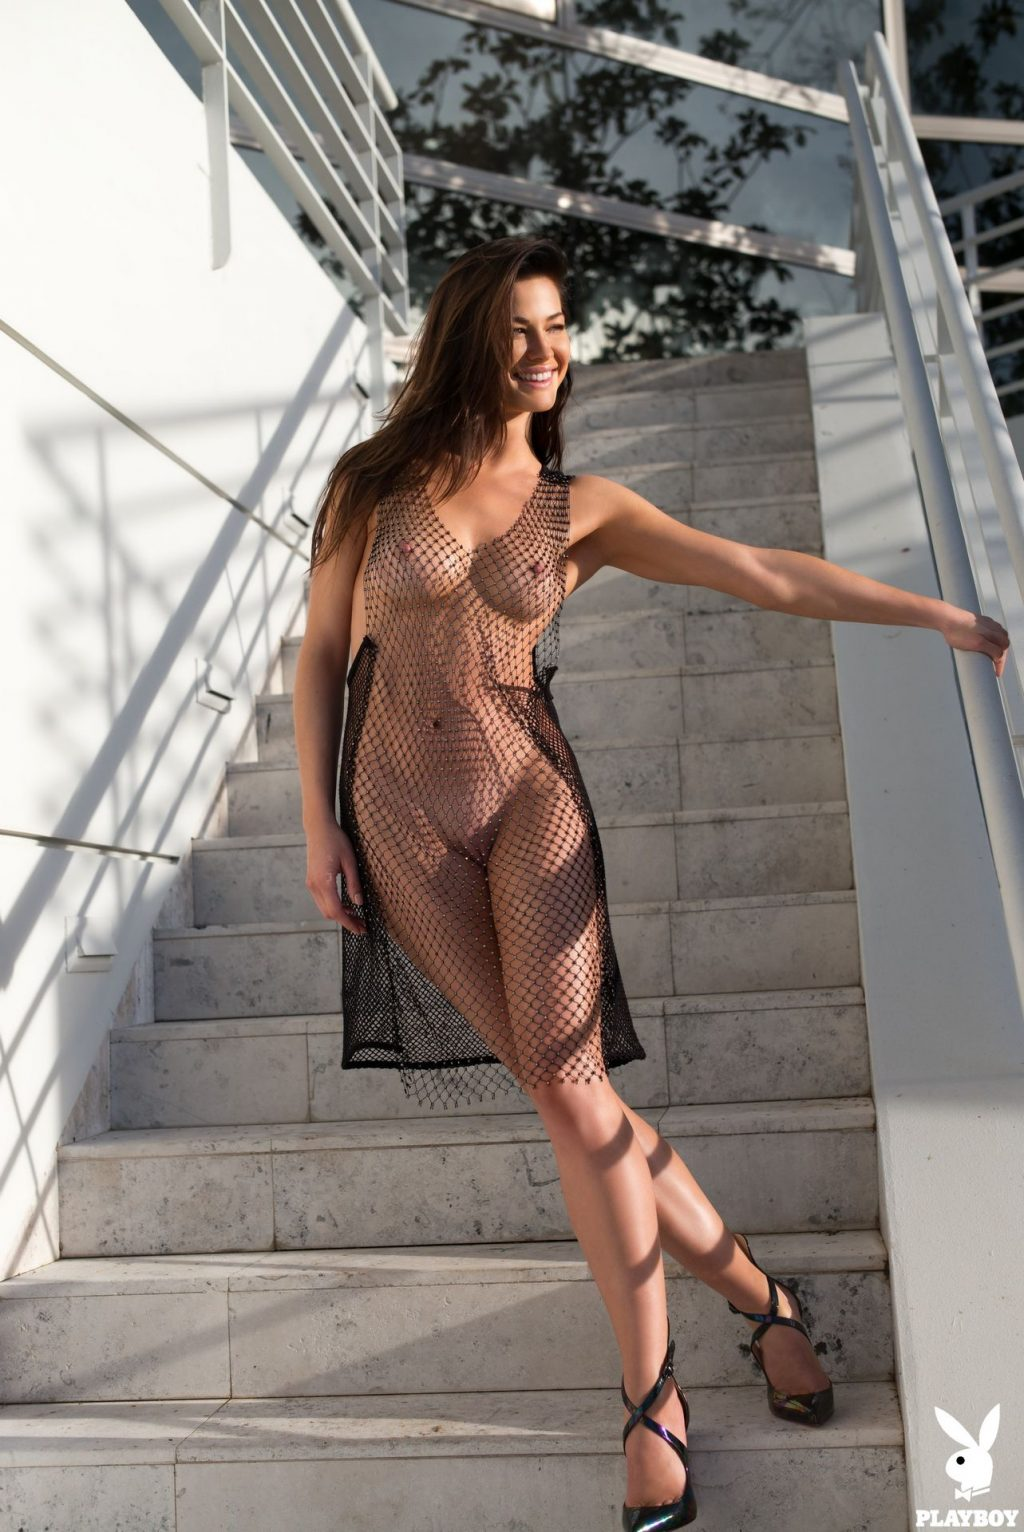 Amanda Santana Nude jenny watwood naked (5 photos) – ( ͡° ͜ʖ ͡°) |the fappening